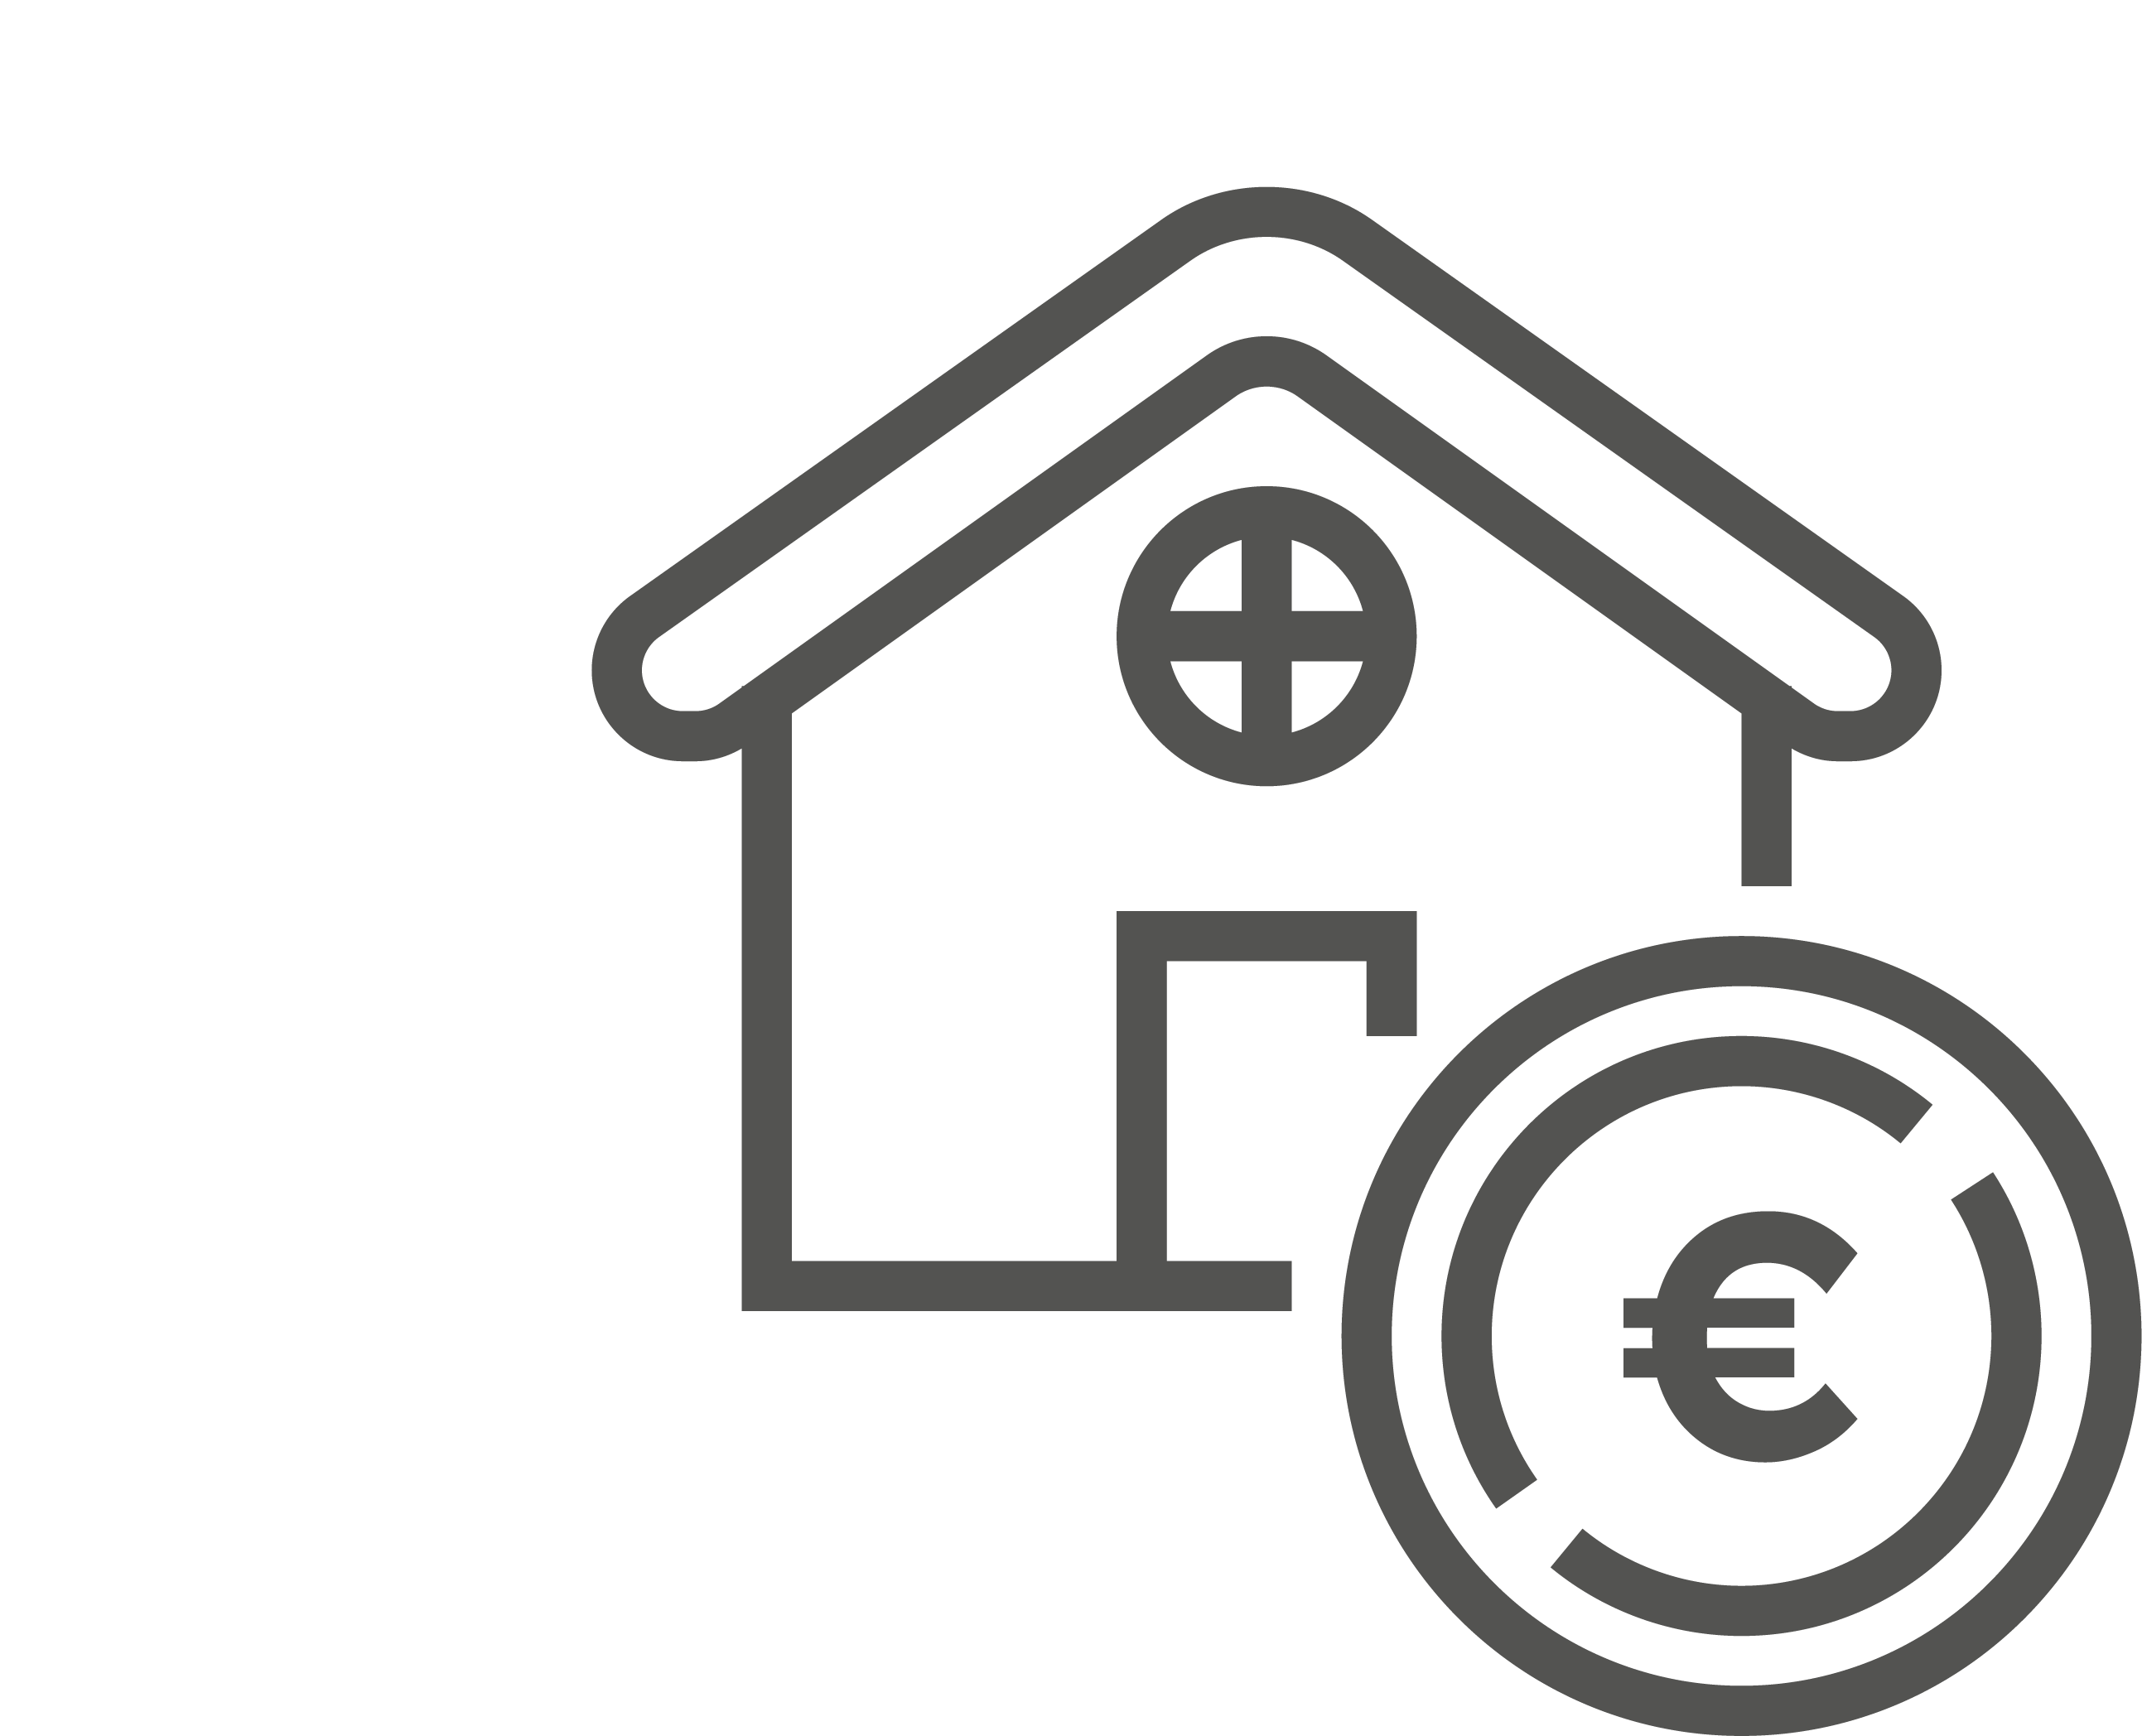 courtier-assurance-emprunteur-pret-defiscalisation-42-credit-immobilier-roanne-charlieu